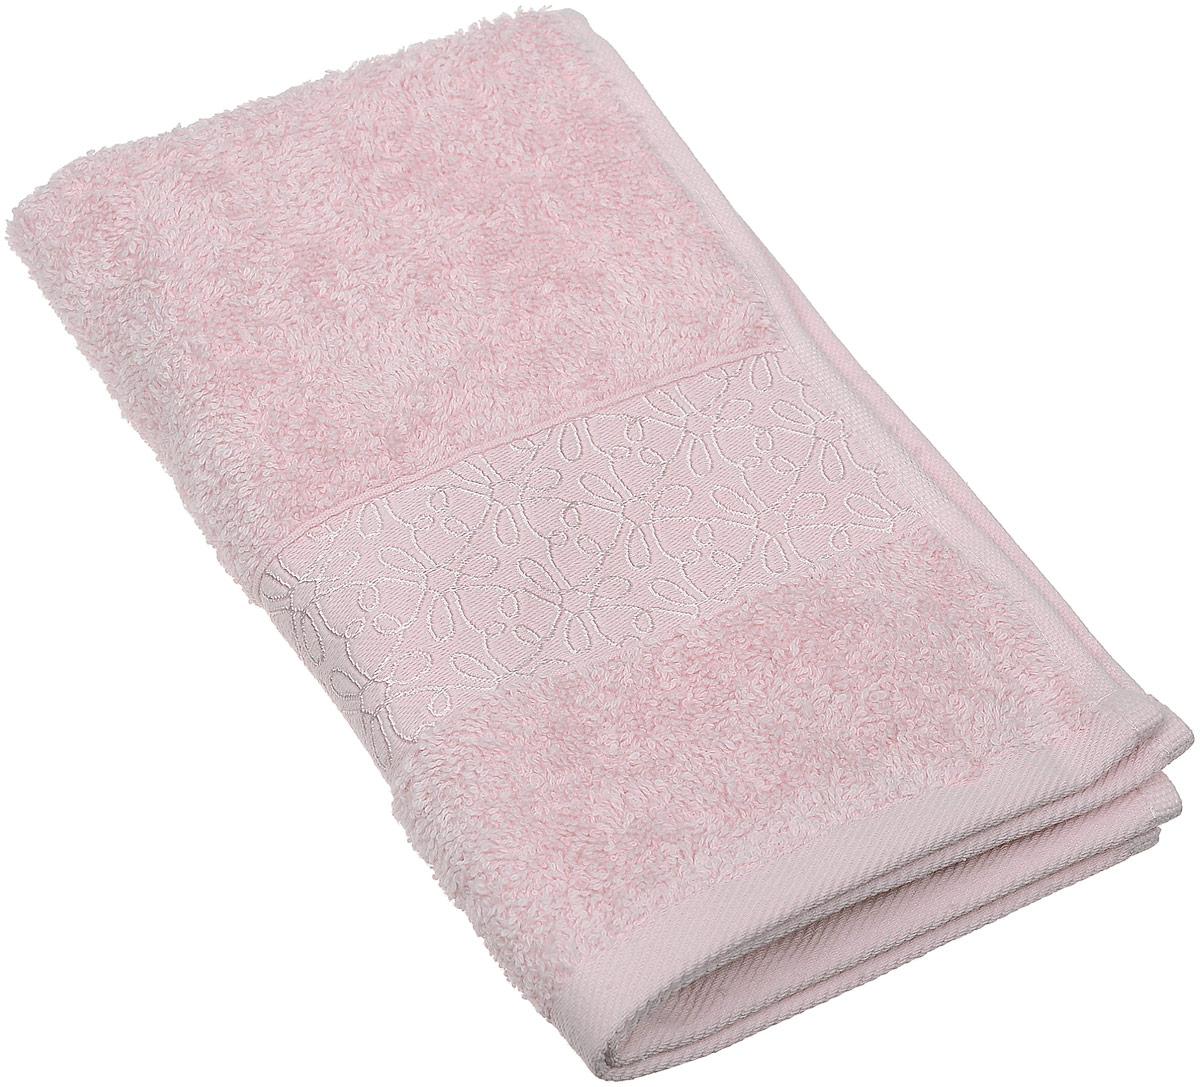 Полотенце махровое Issimo Home Perin, цвет: пудровый, 30 х 50 см полотенце бамбуковое issimo home valencia цвет розовый 90 x 150 см